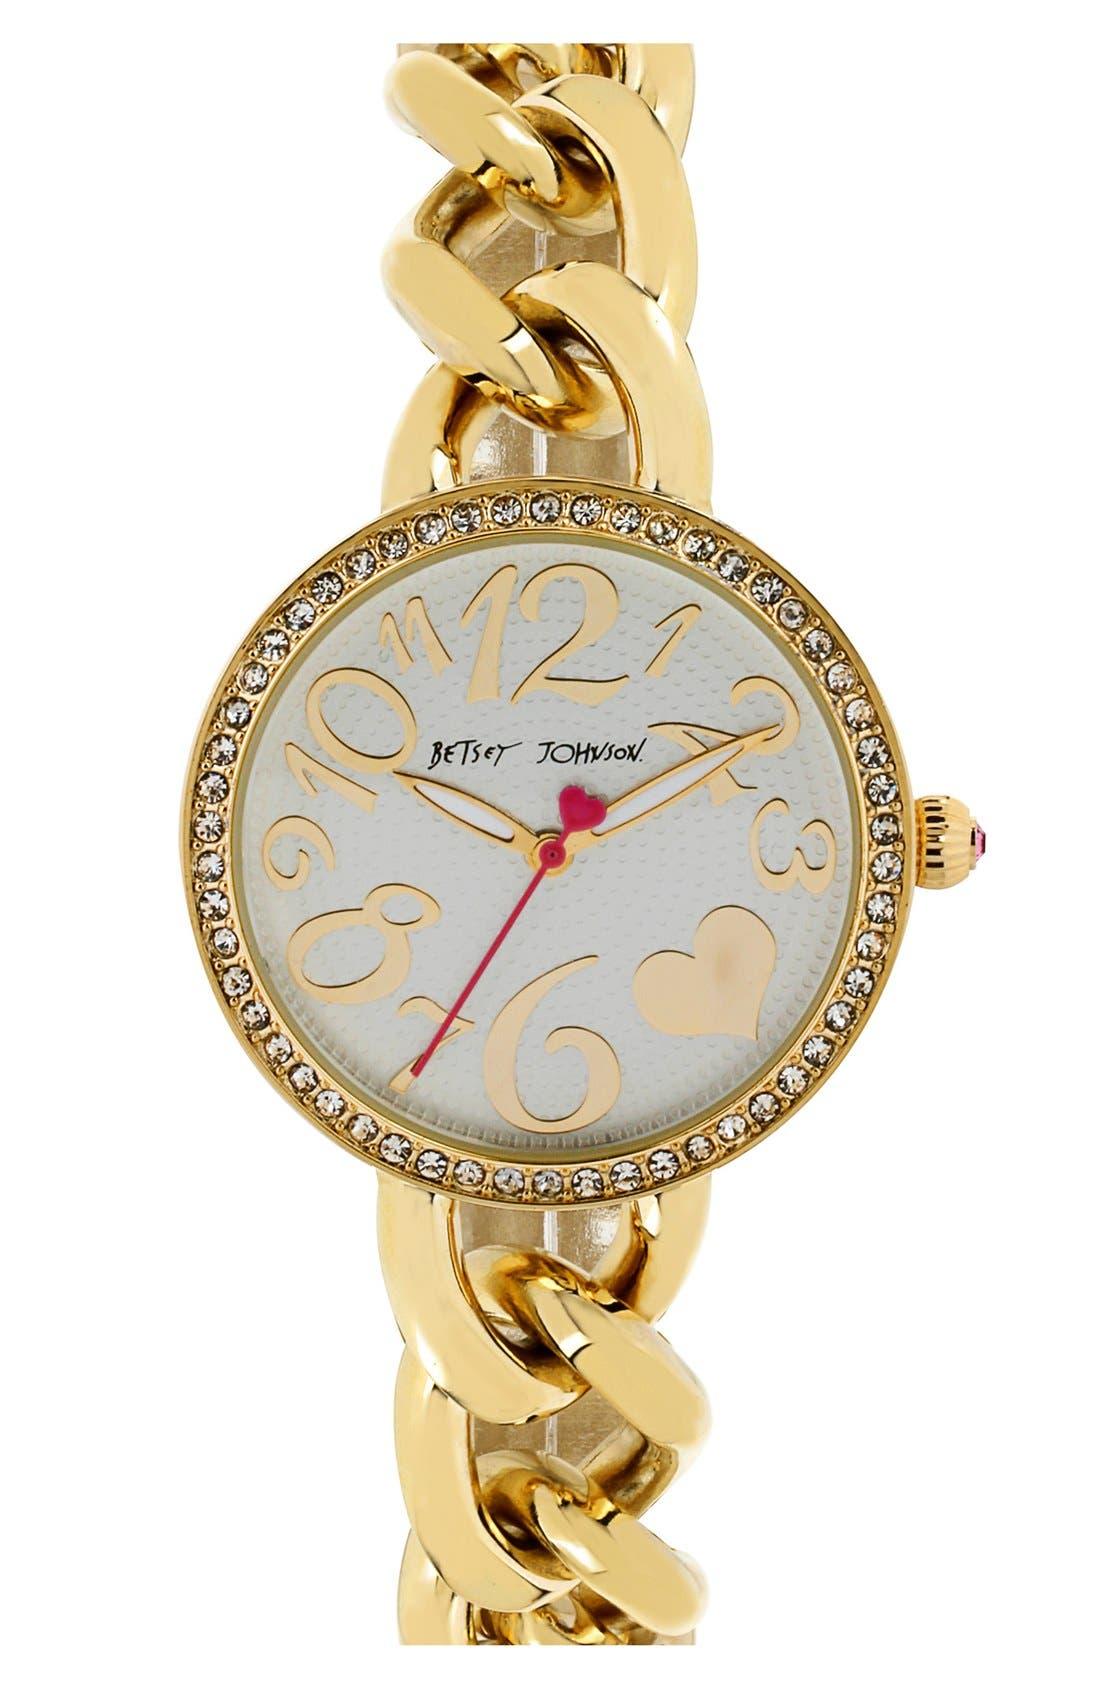 Alternate Image 1 Selected - Betsey Johnson Crystal Bezel Chain Link Bracelet Watch, 34mm